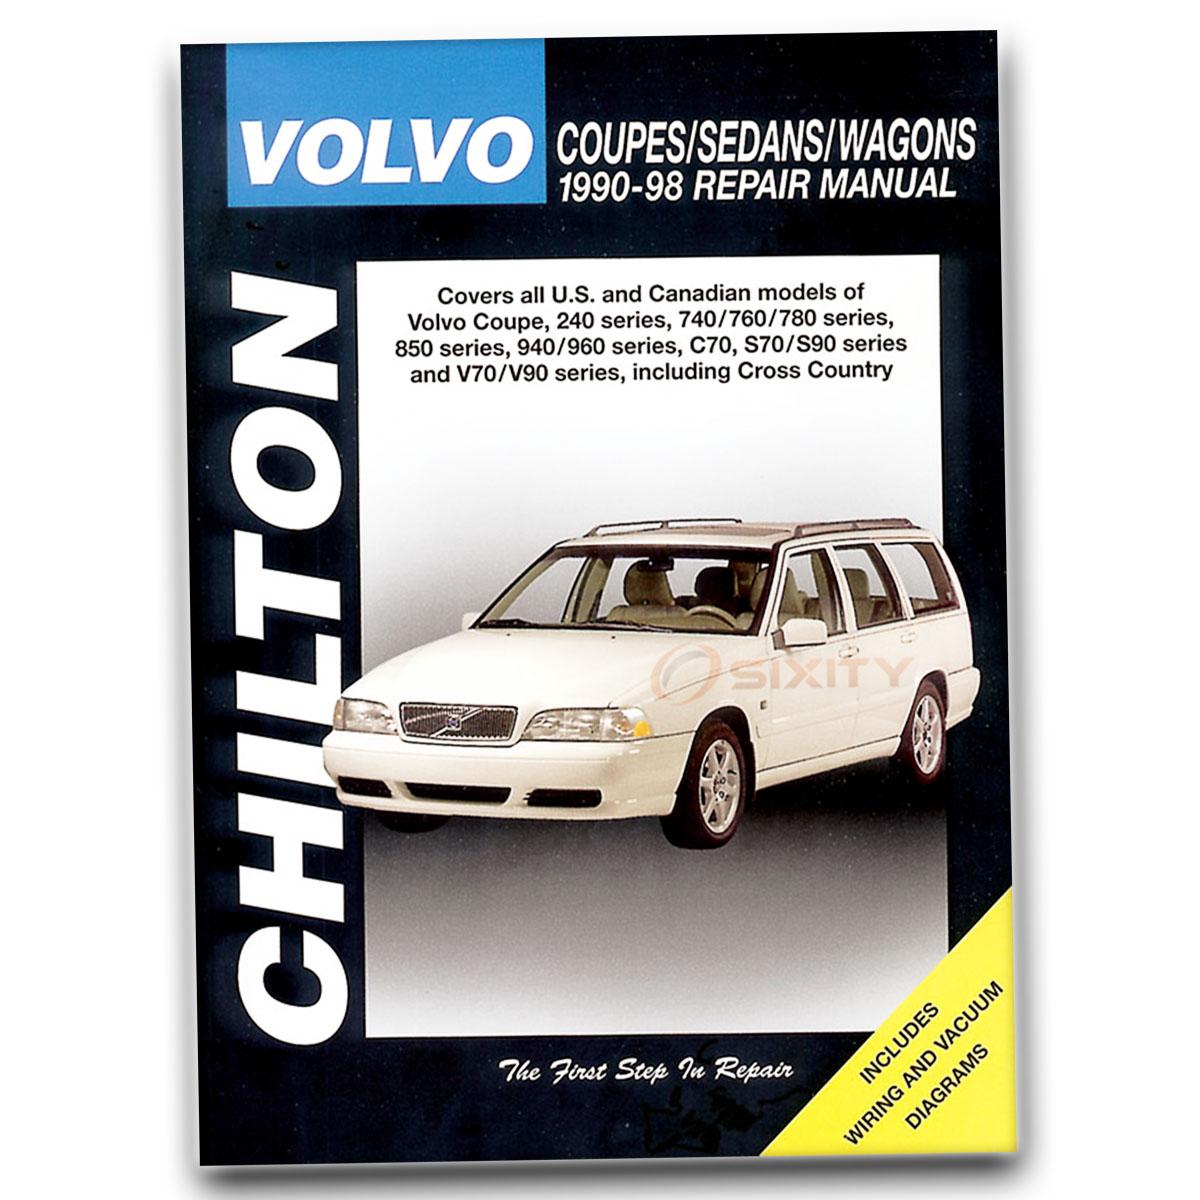 volvo 740 turbo fuel pump wiring diagram  volvo  free 92 Volvo 940 Turbo volvo 940 turbo service manual